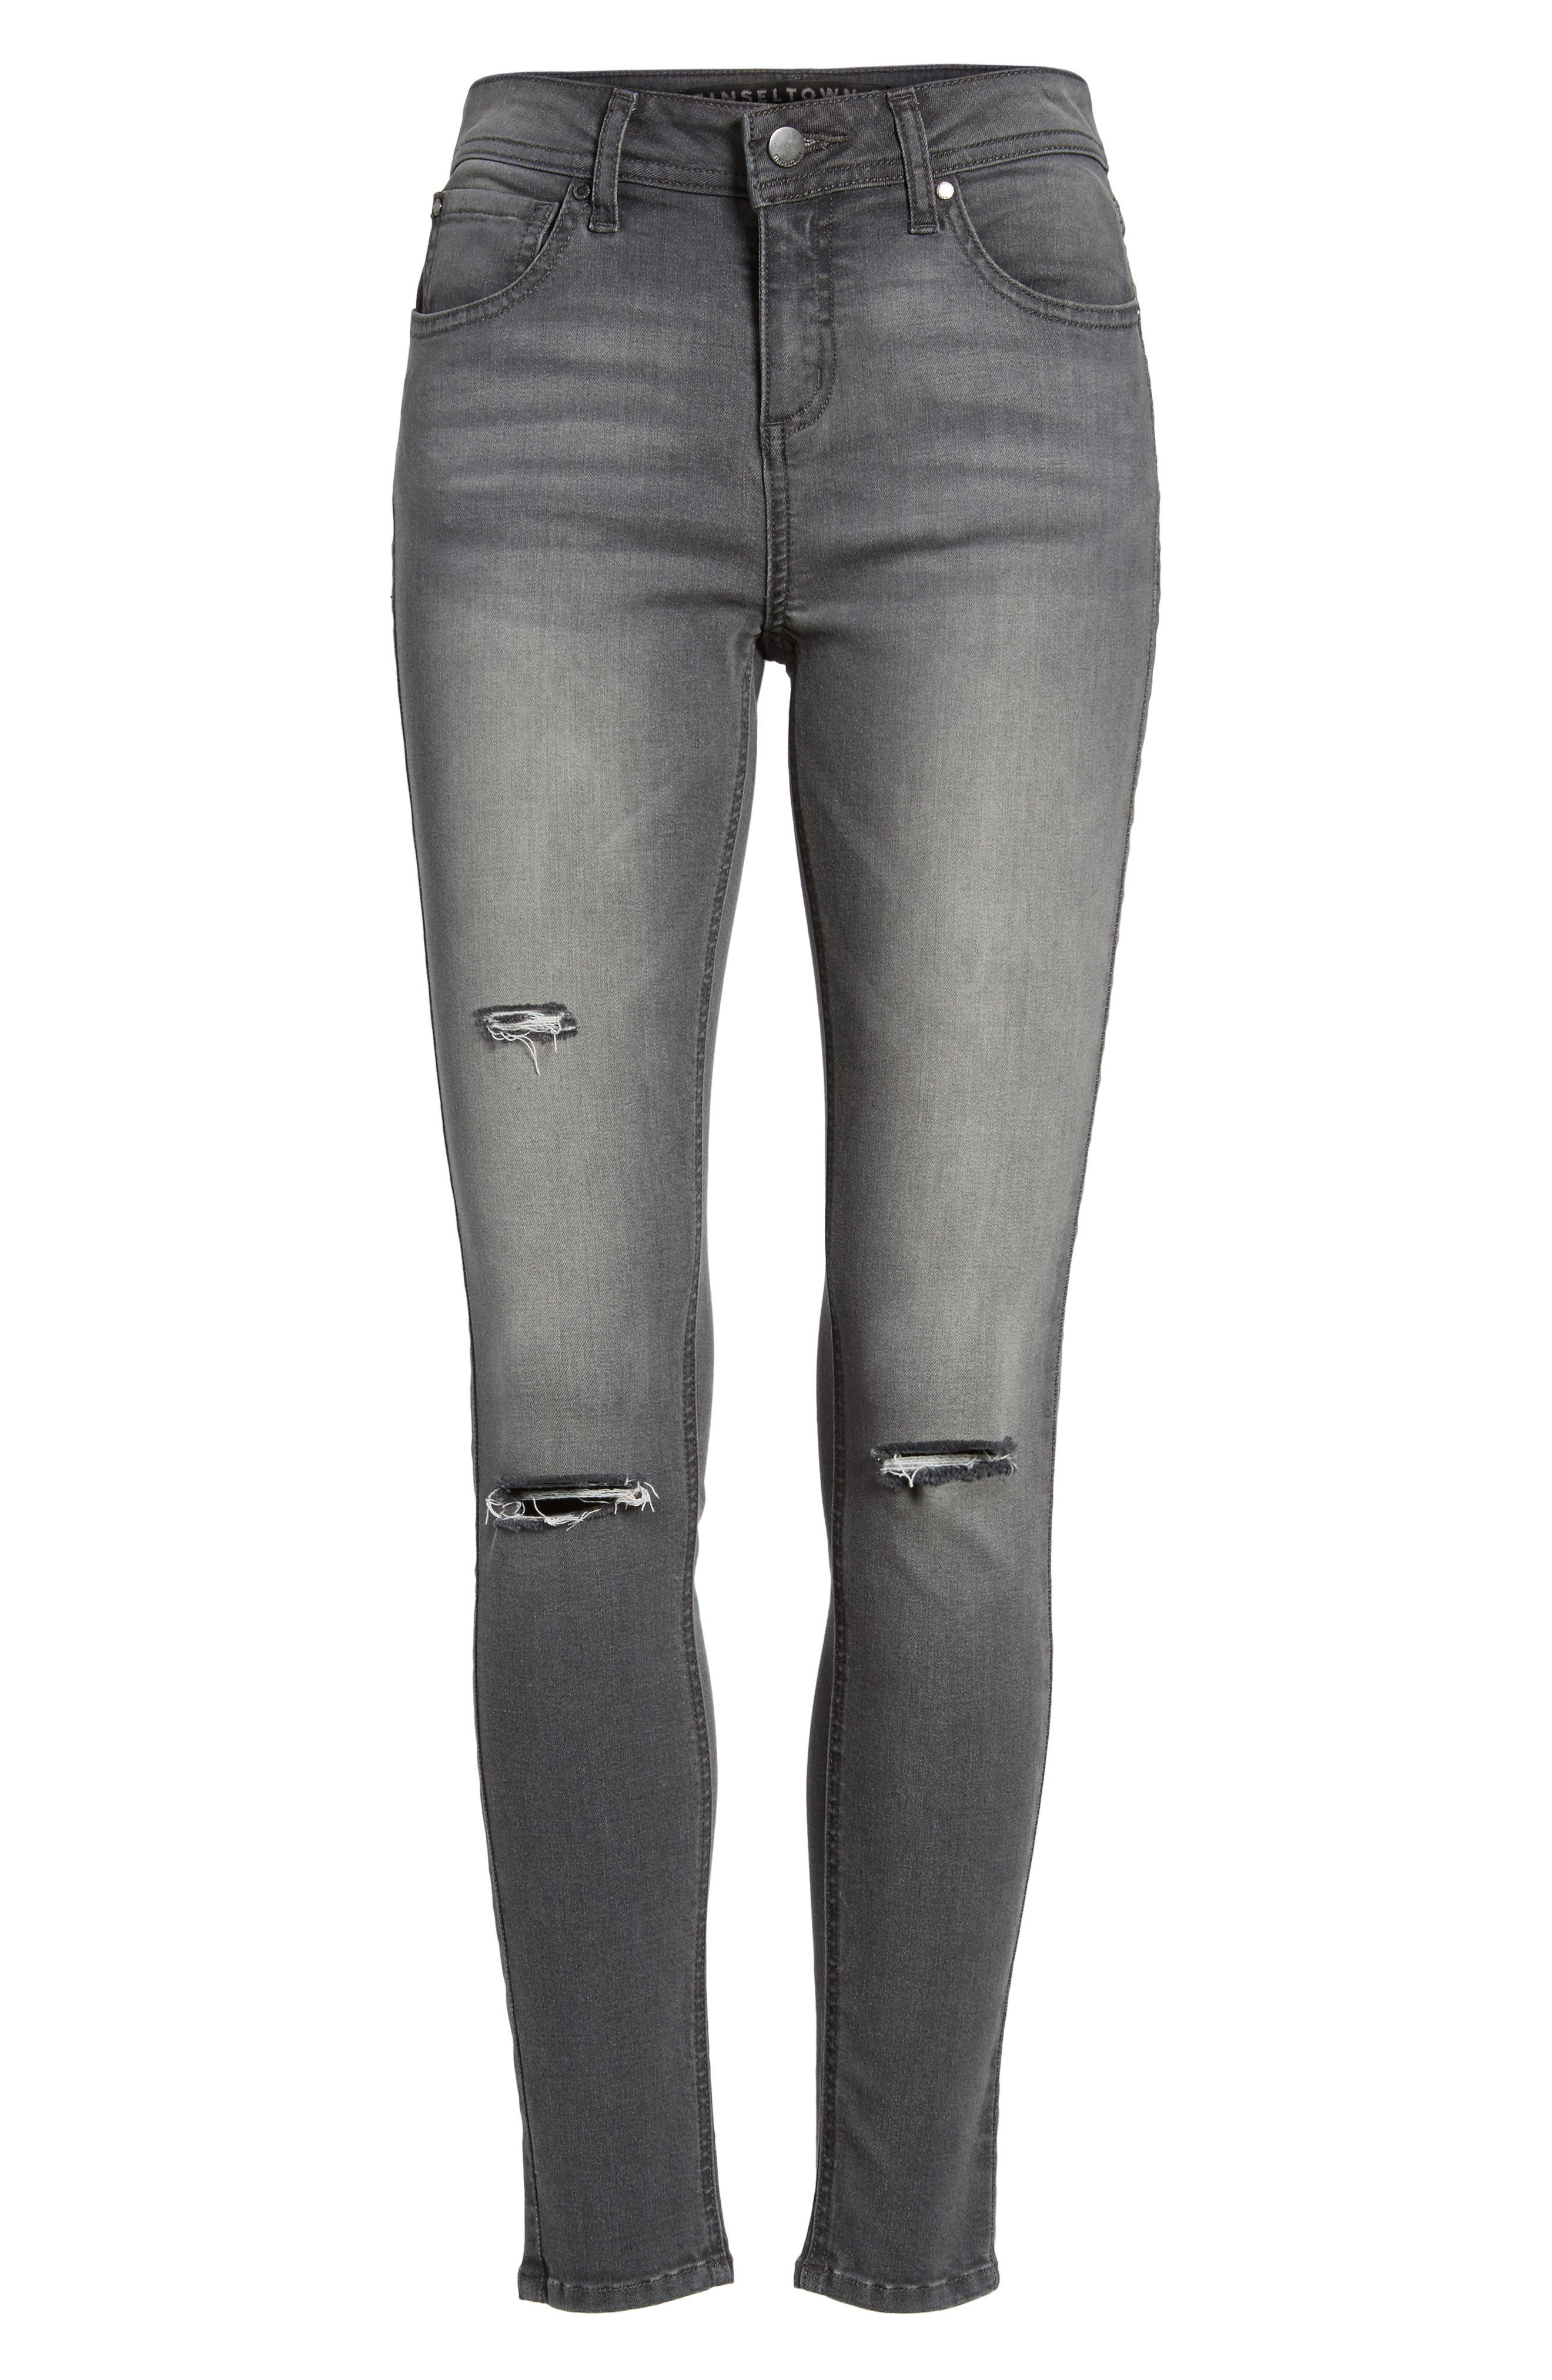 Ripped Skinny Jeans,                             Alternate thumbnail 6, color,                             Rebelite Charcoal